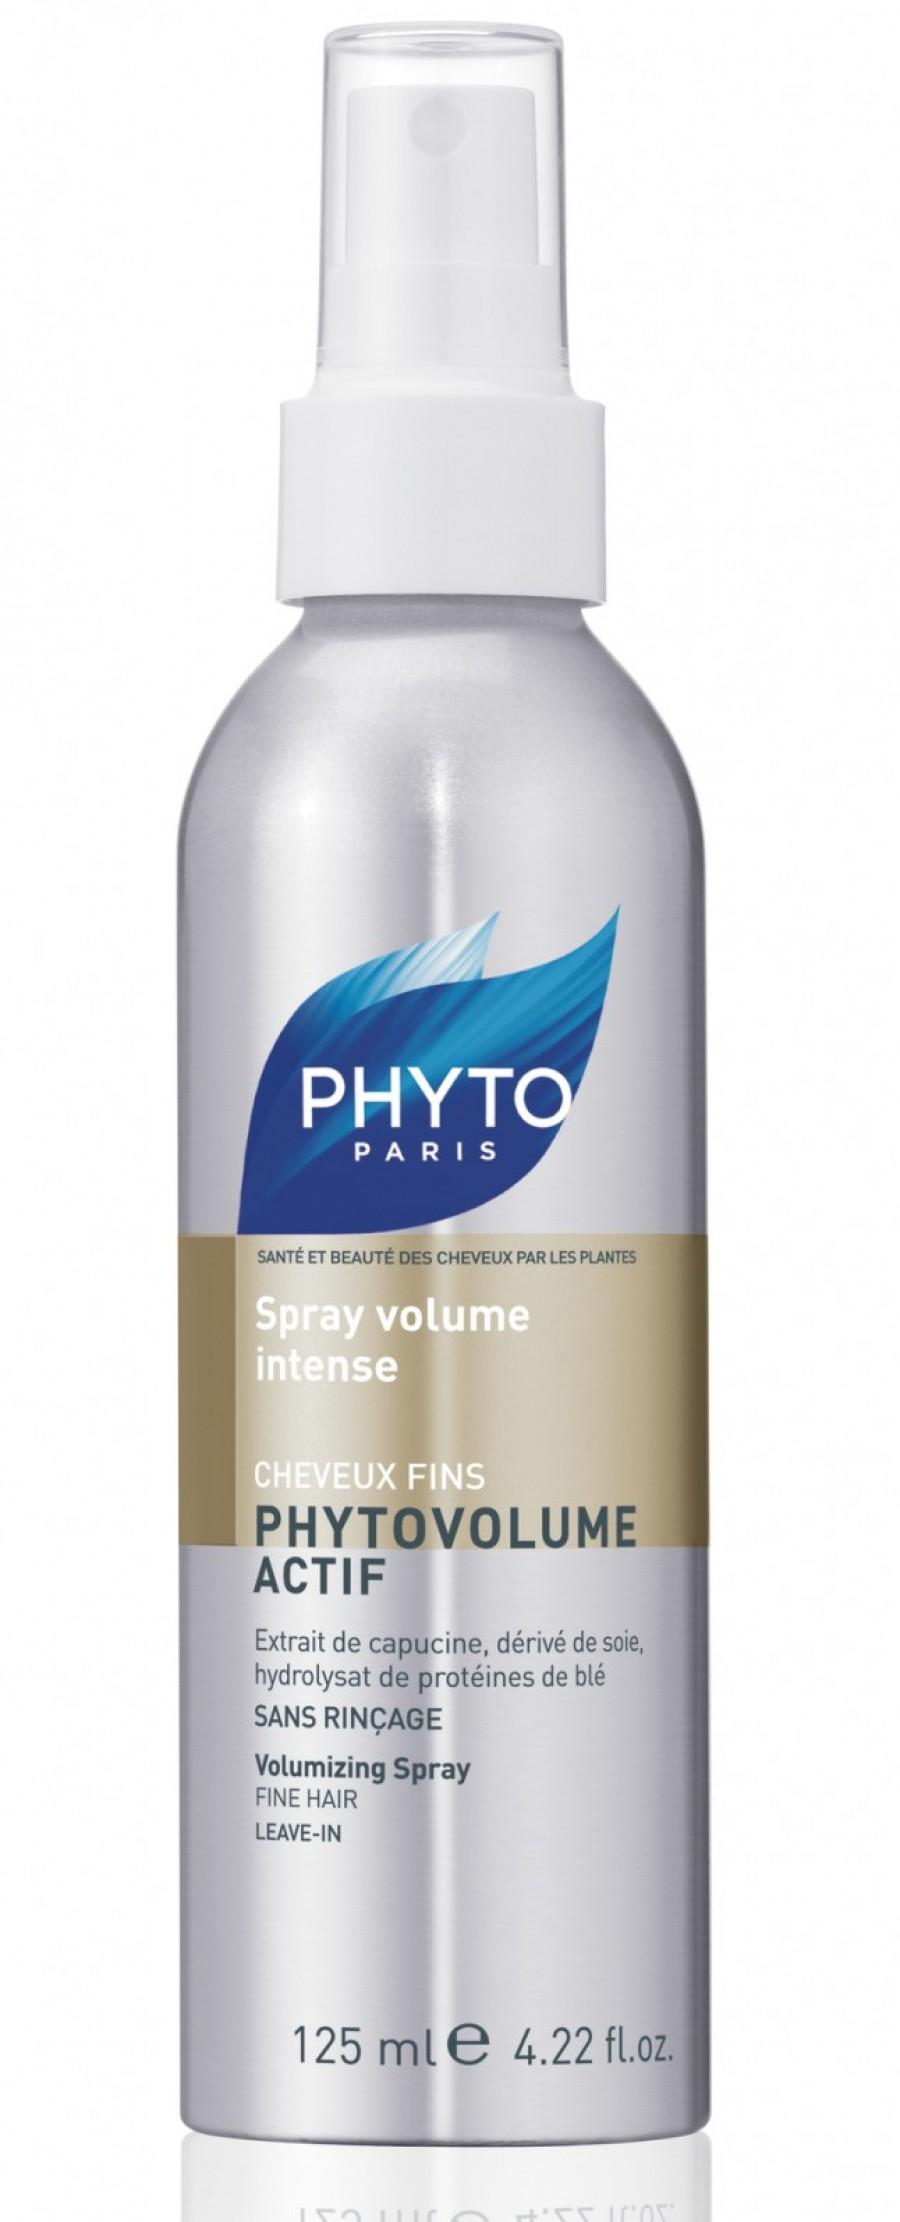 Phytovolume_Actif_300_neu